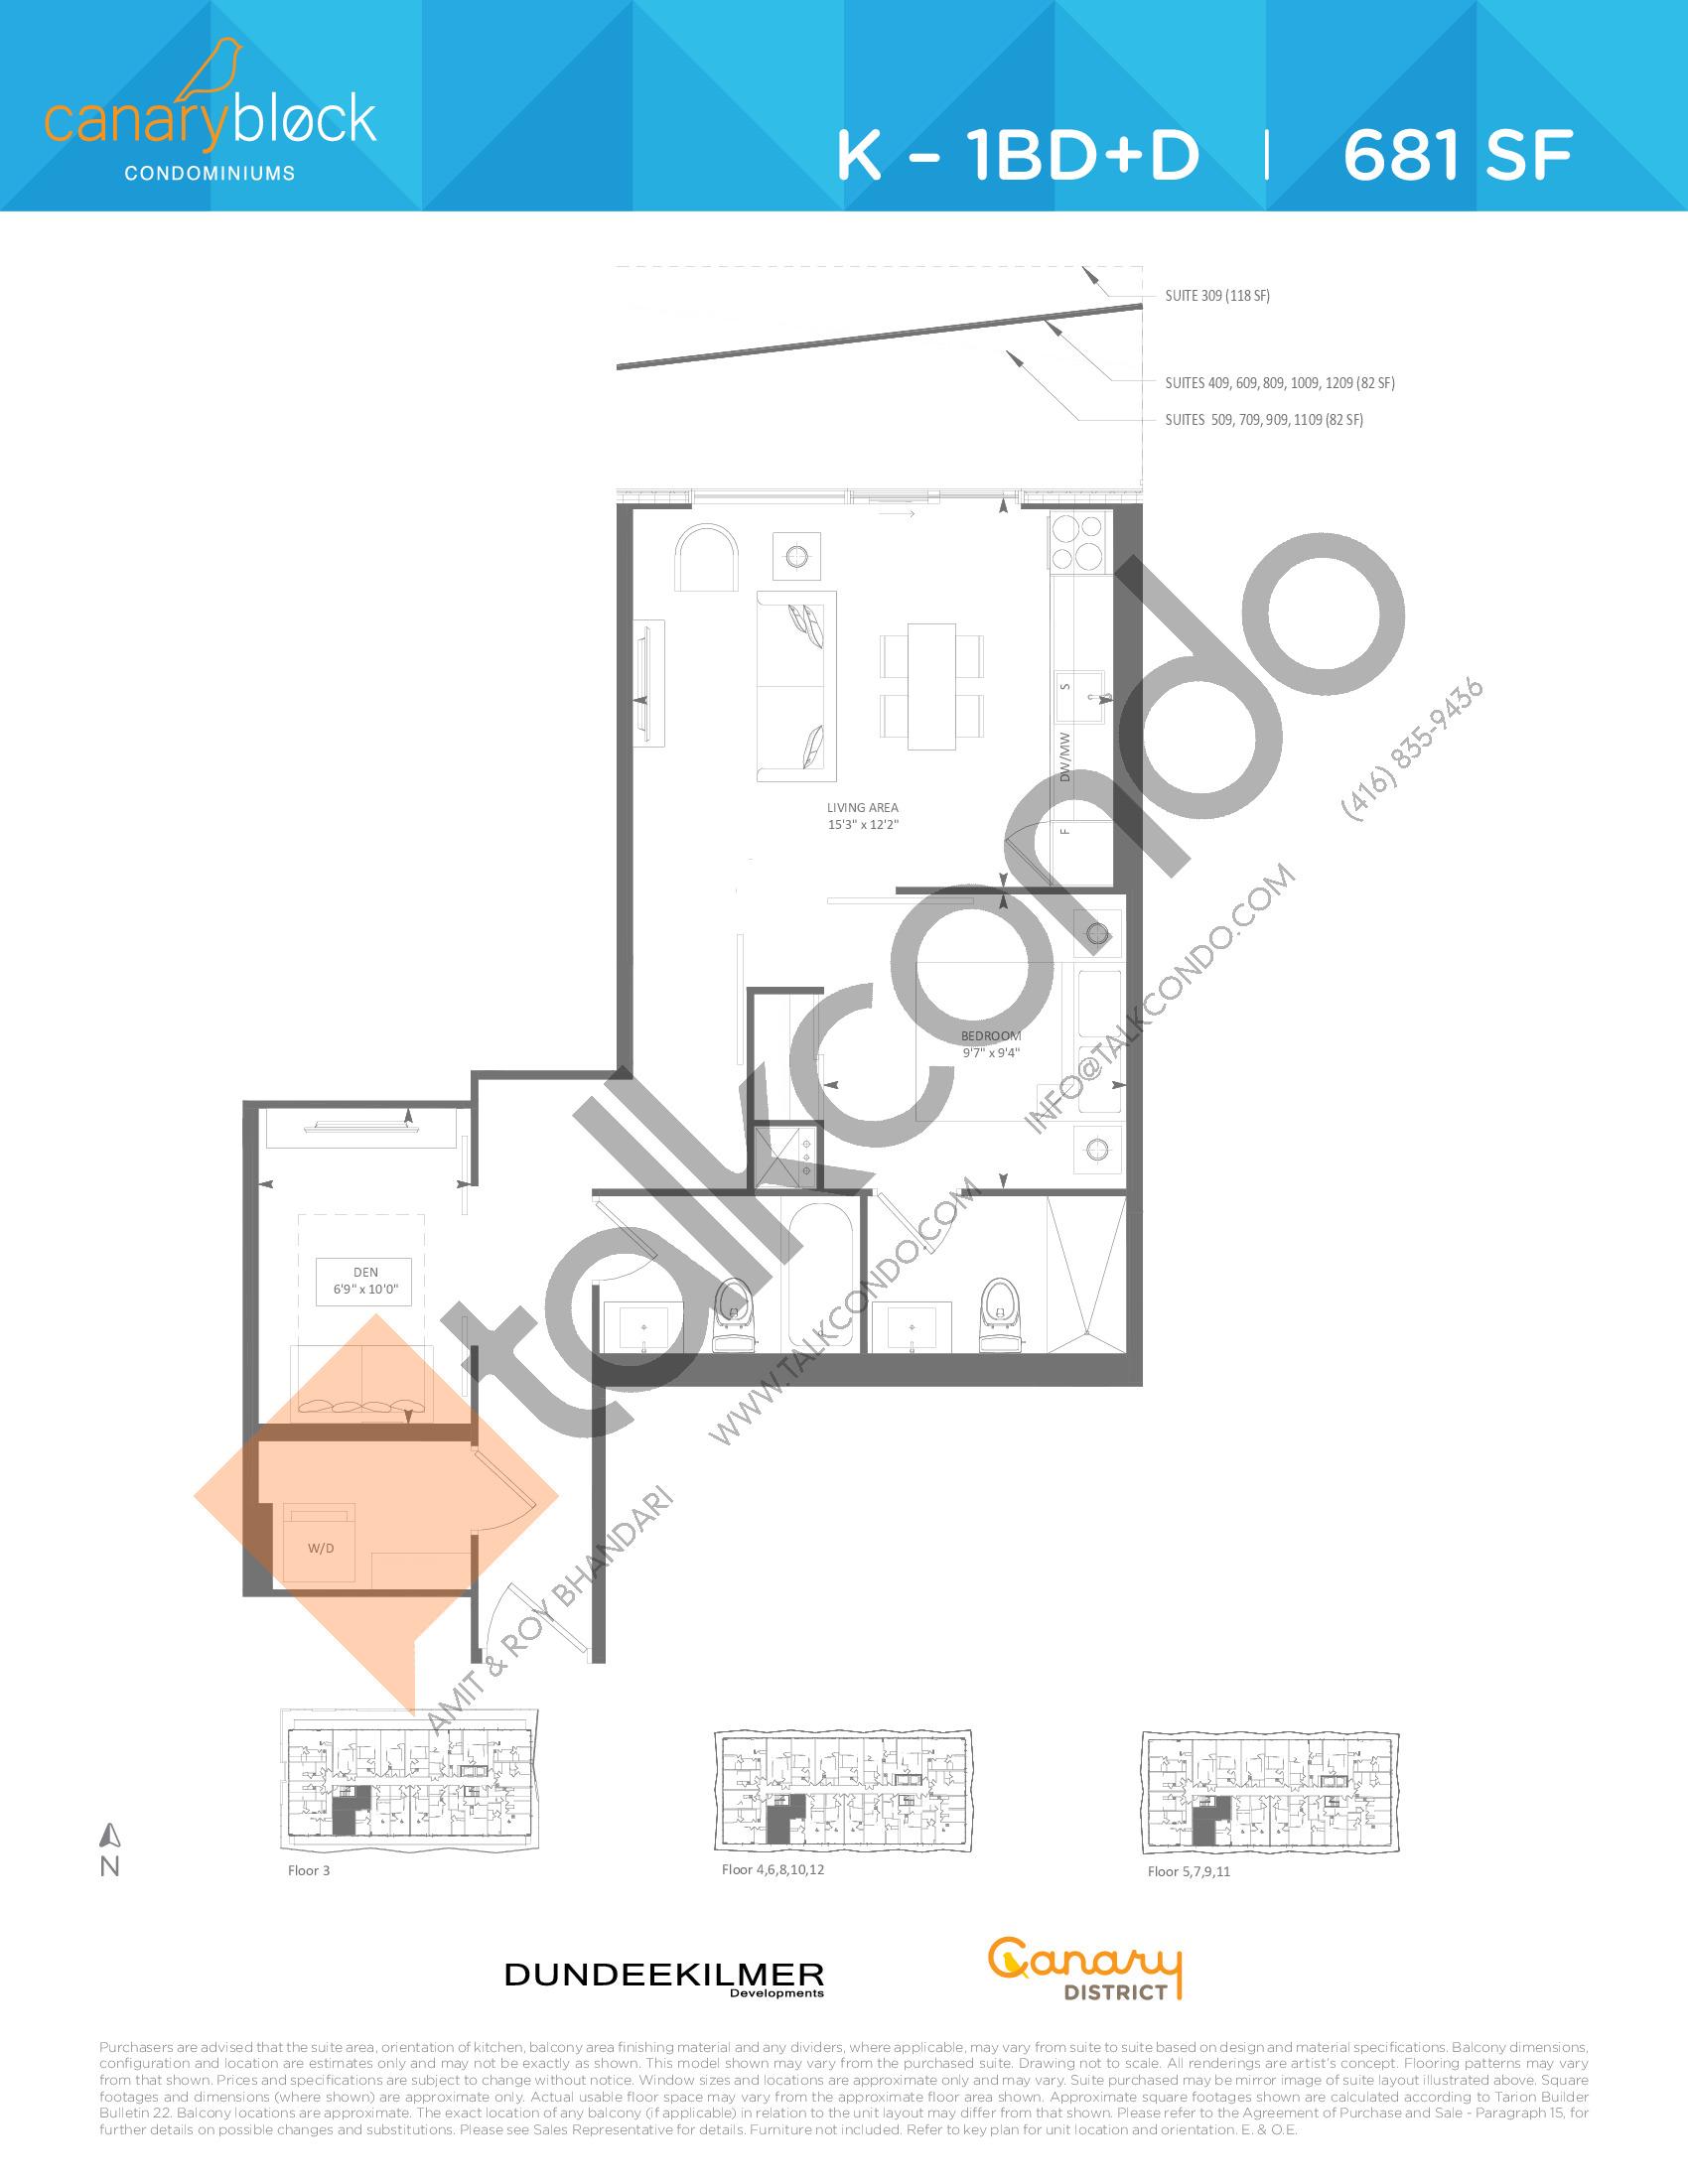 K - 1BD+D Floor Plan at Canary Block Condos - 681 sq.ft